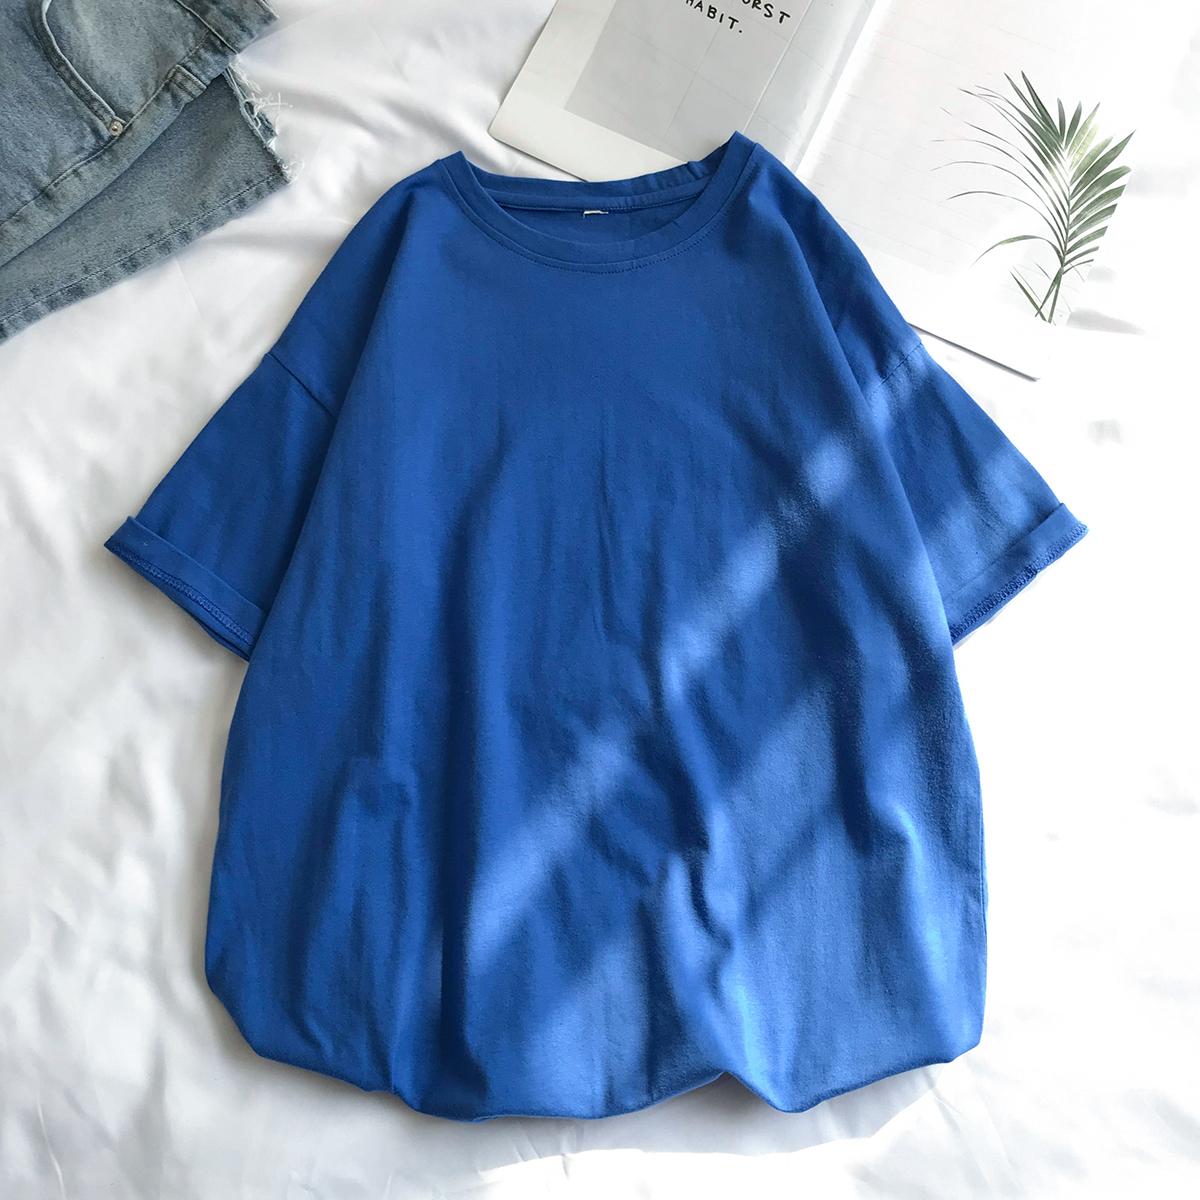 T927 로얄 블루